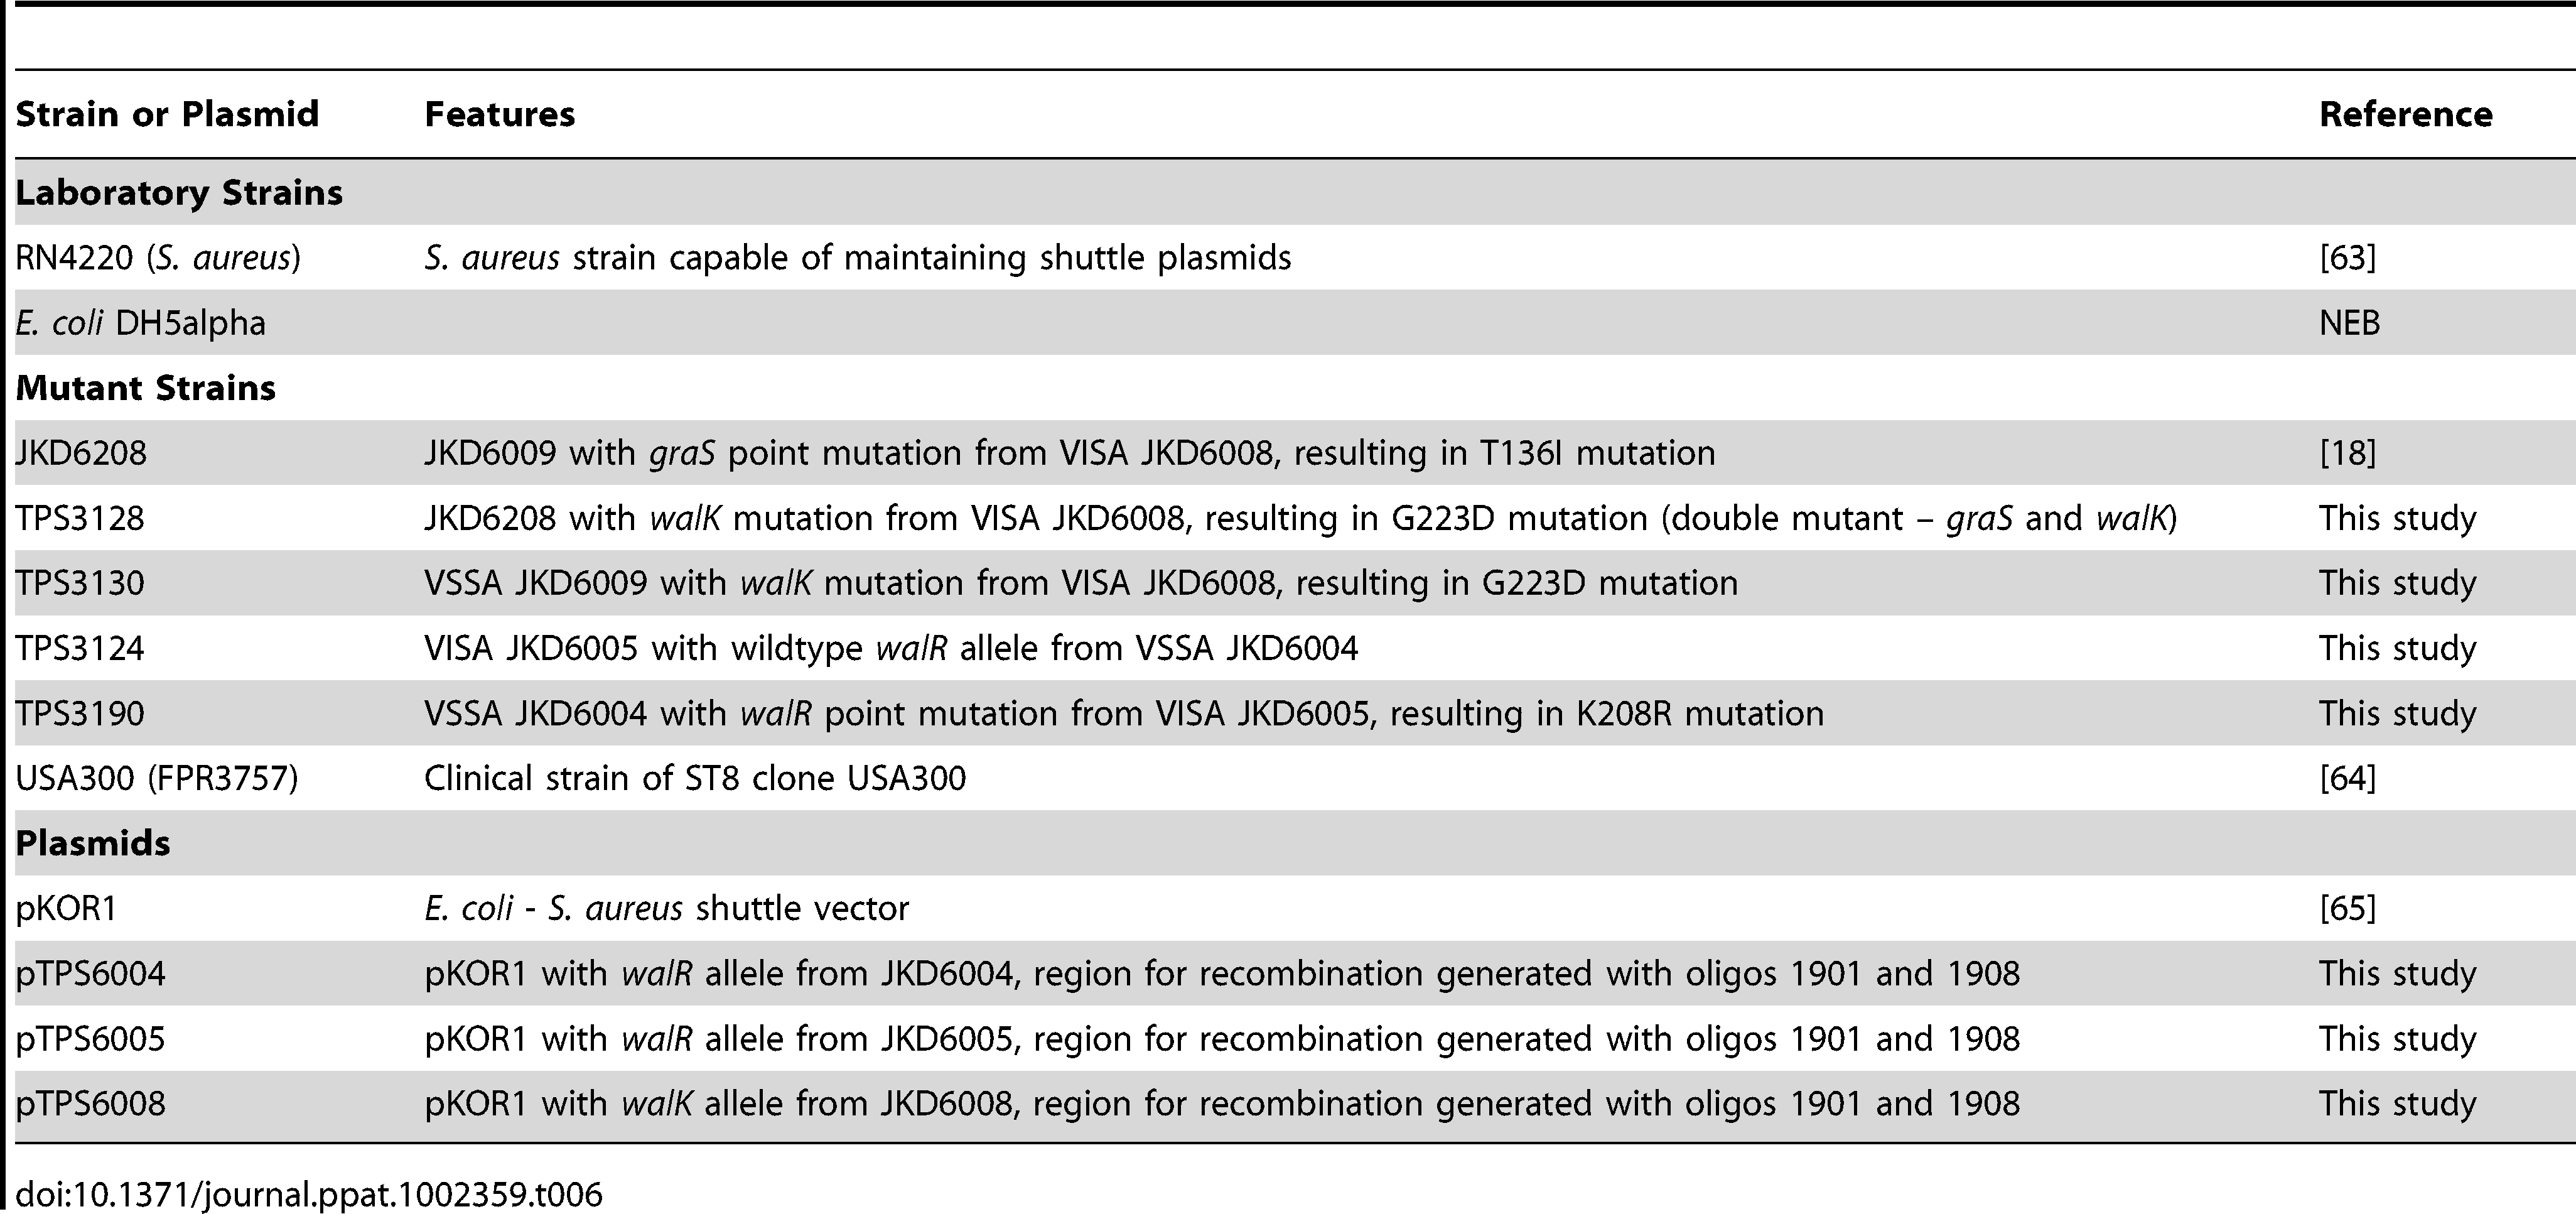 Laboratory strains, mutant strains, and plasmids used in study.